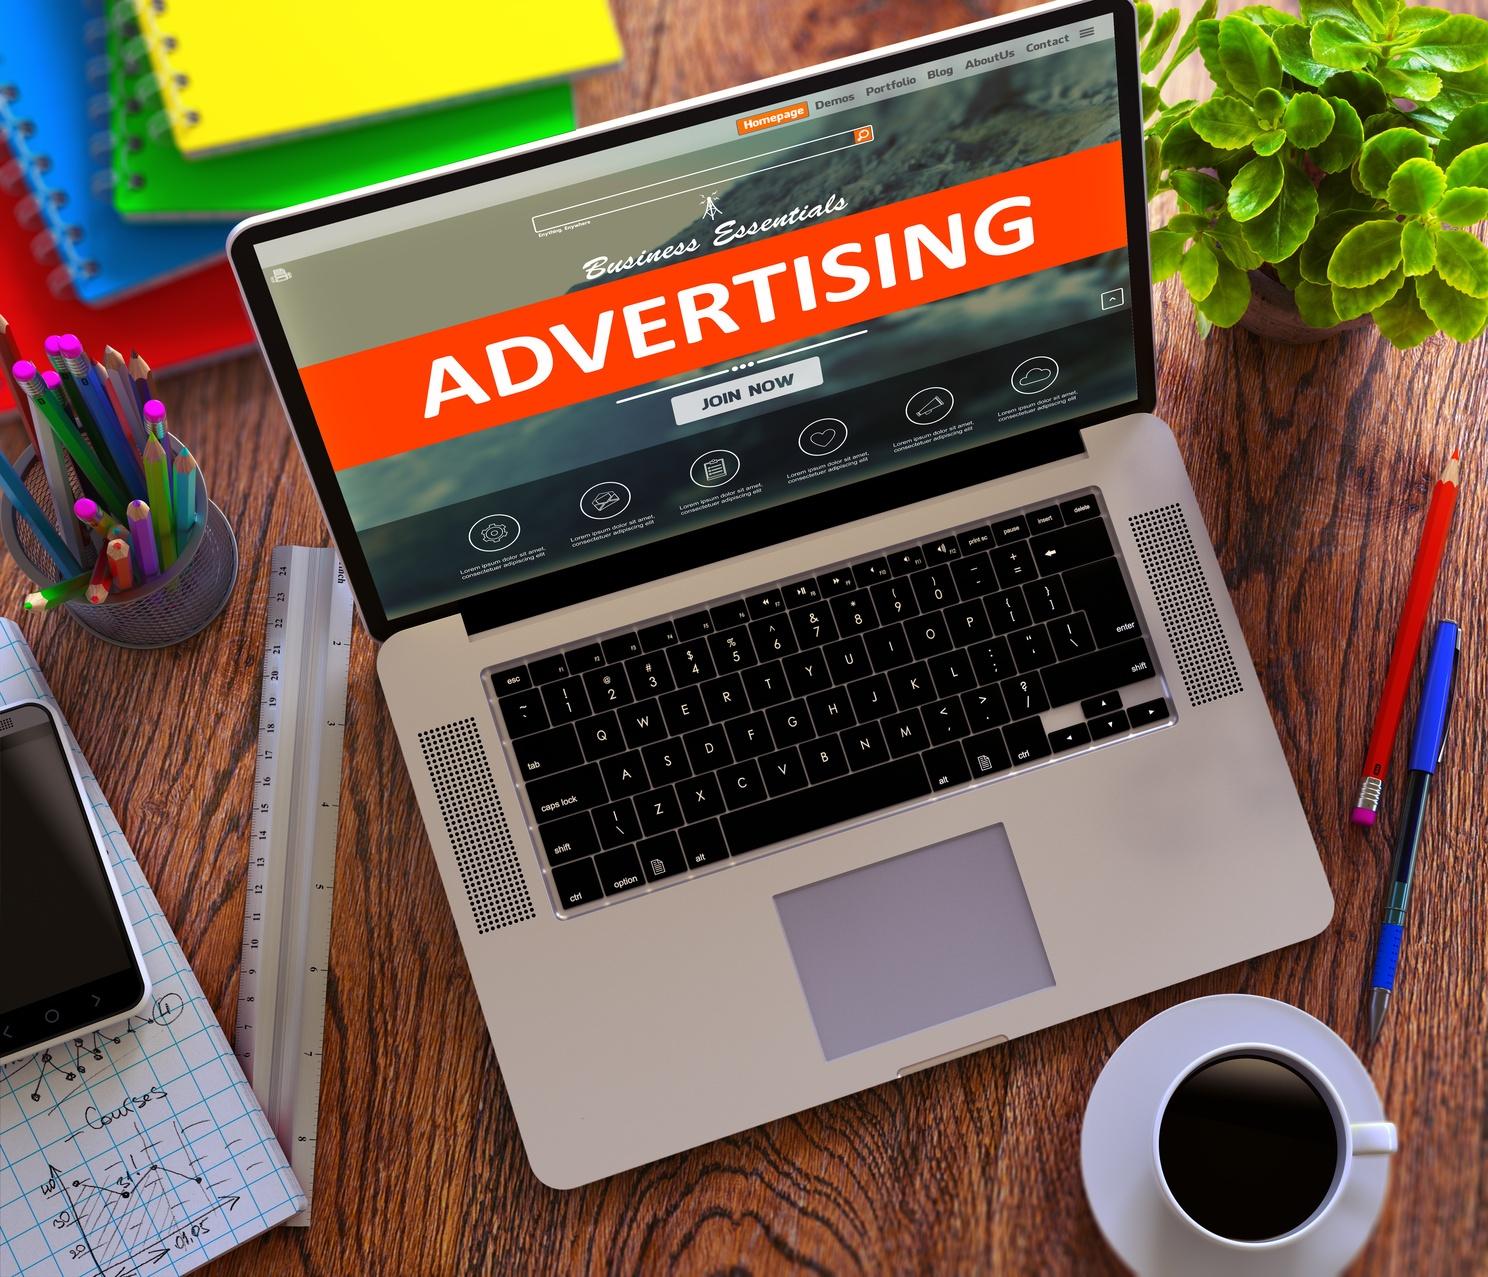 digital-advertising-working-office-concept.jpg